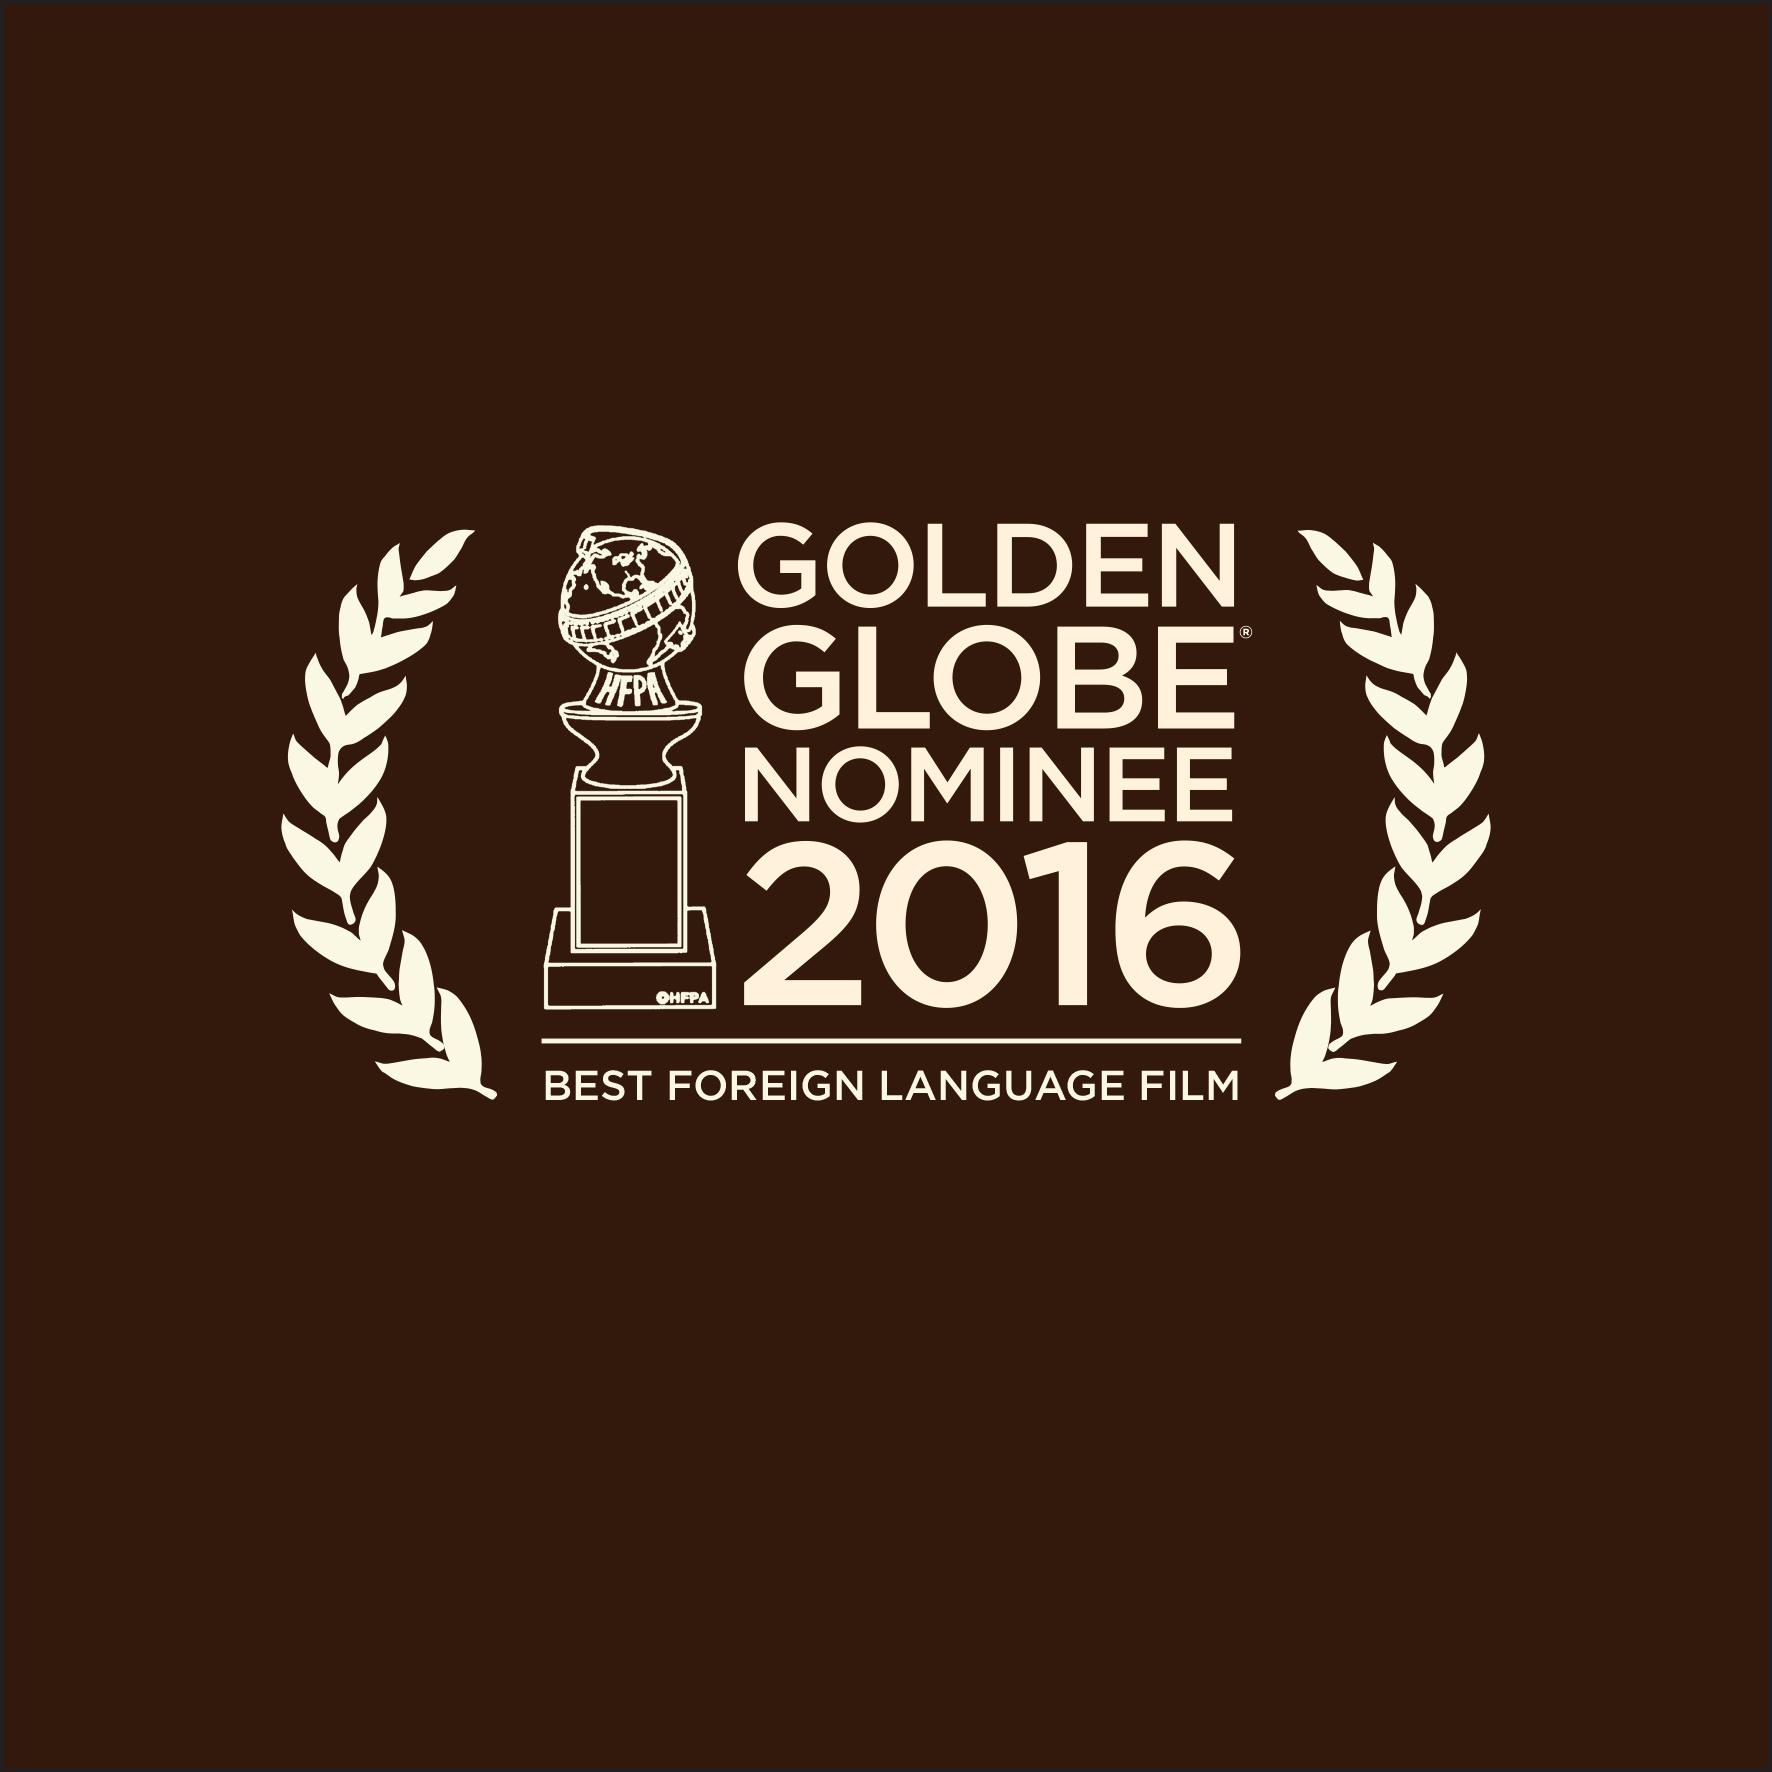 Golden Globes Logos